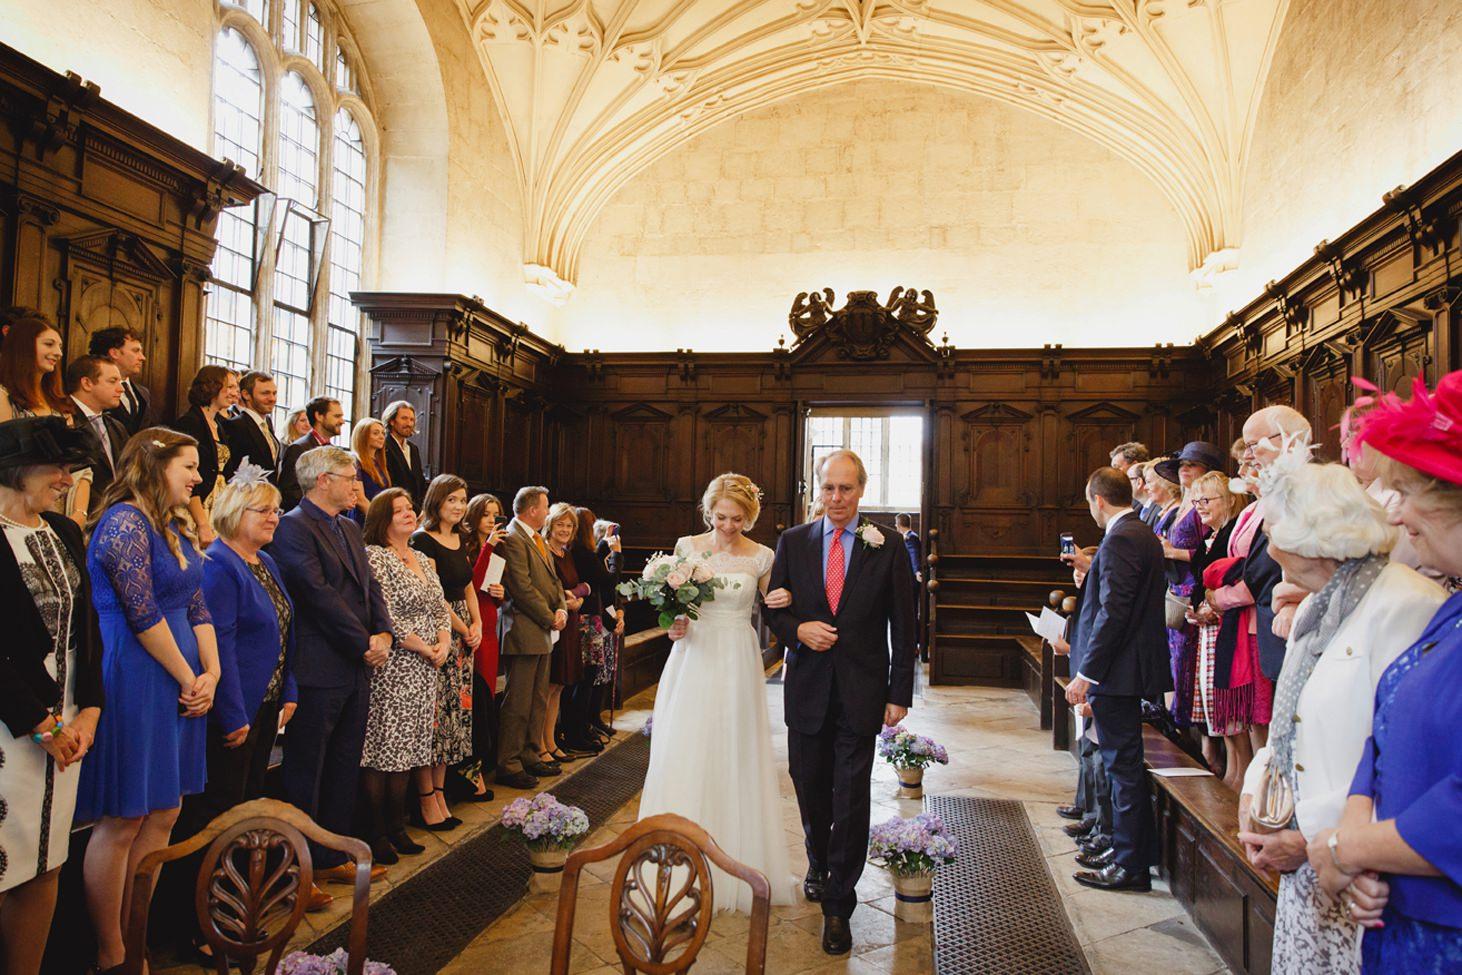 Bodleian library wedding bride walking down aisle